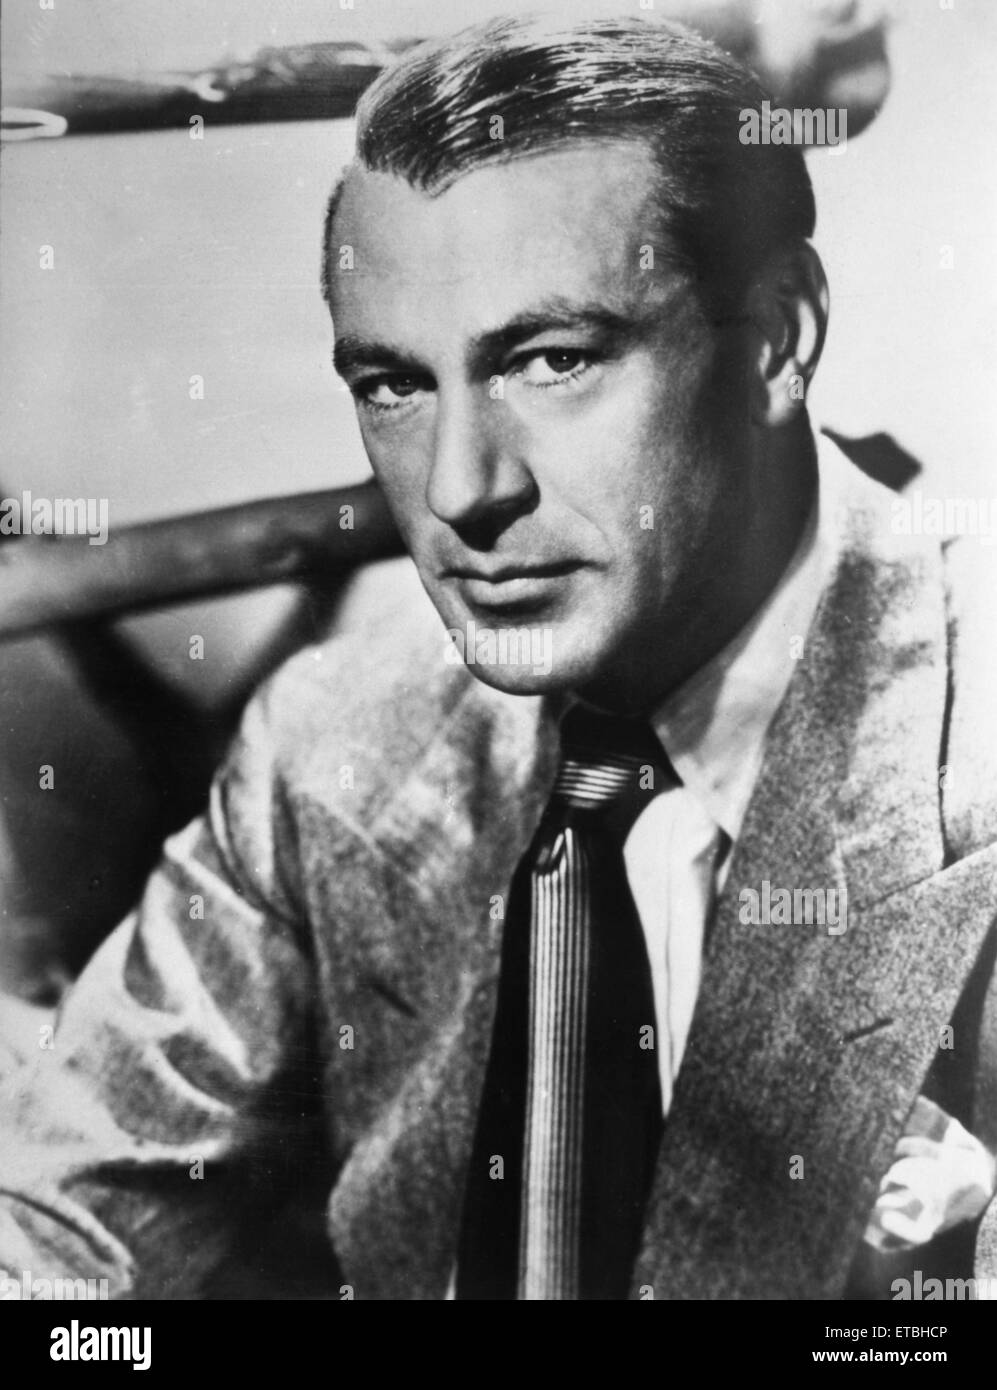 Schauspieler Gary Cooper, Werbung Portrait, ca. 1940 Stockbild